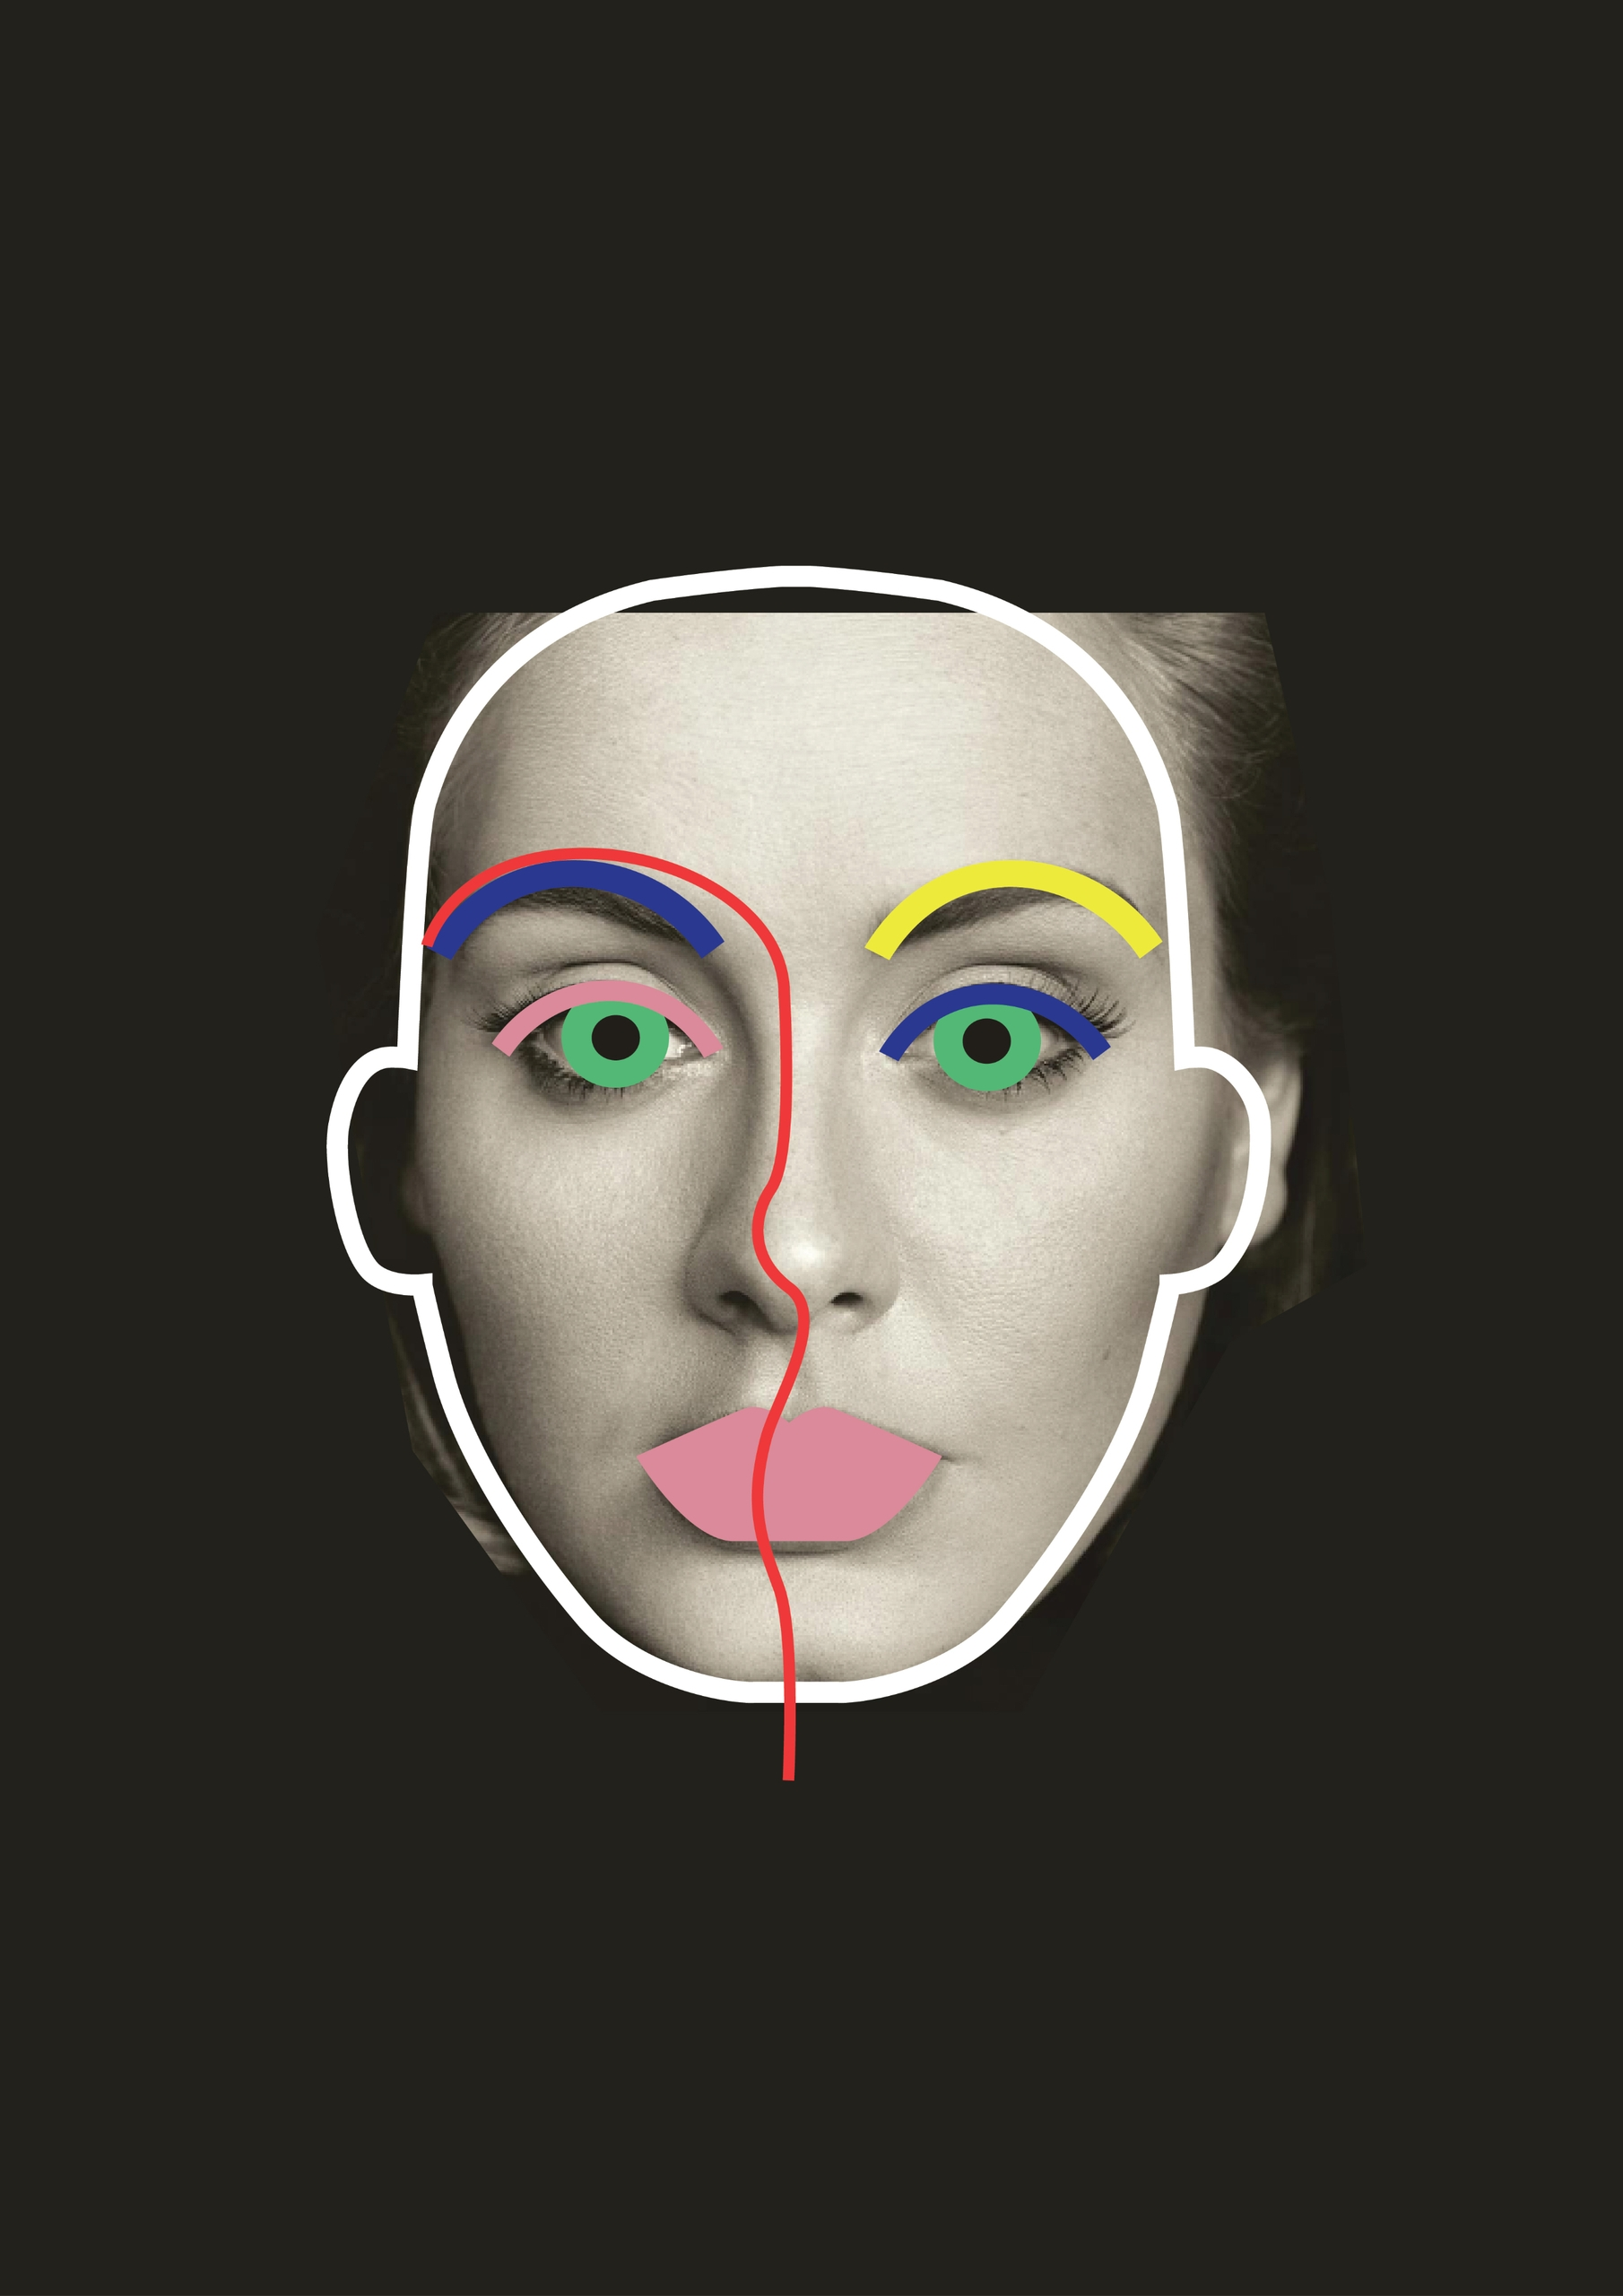 Adele rework - michaelaselmani | ello